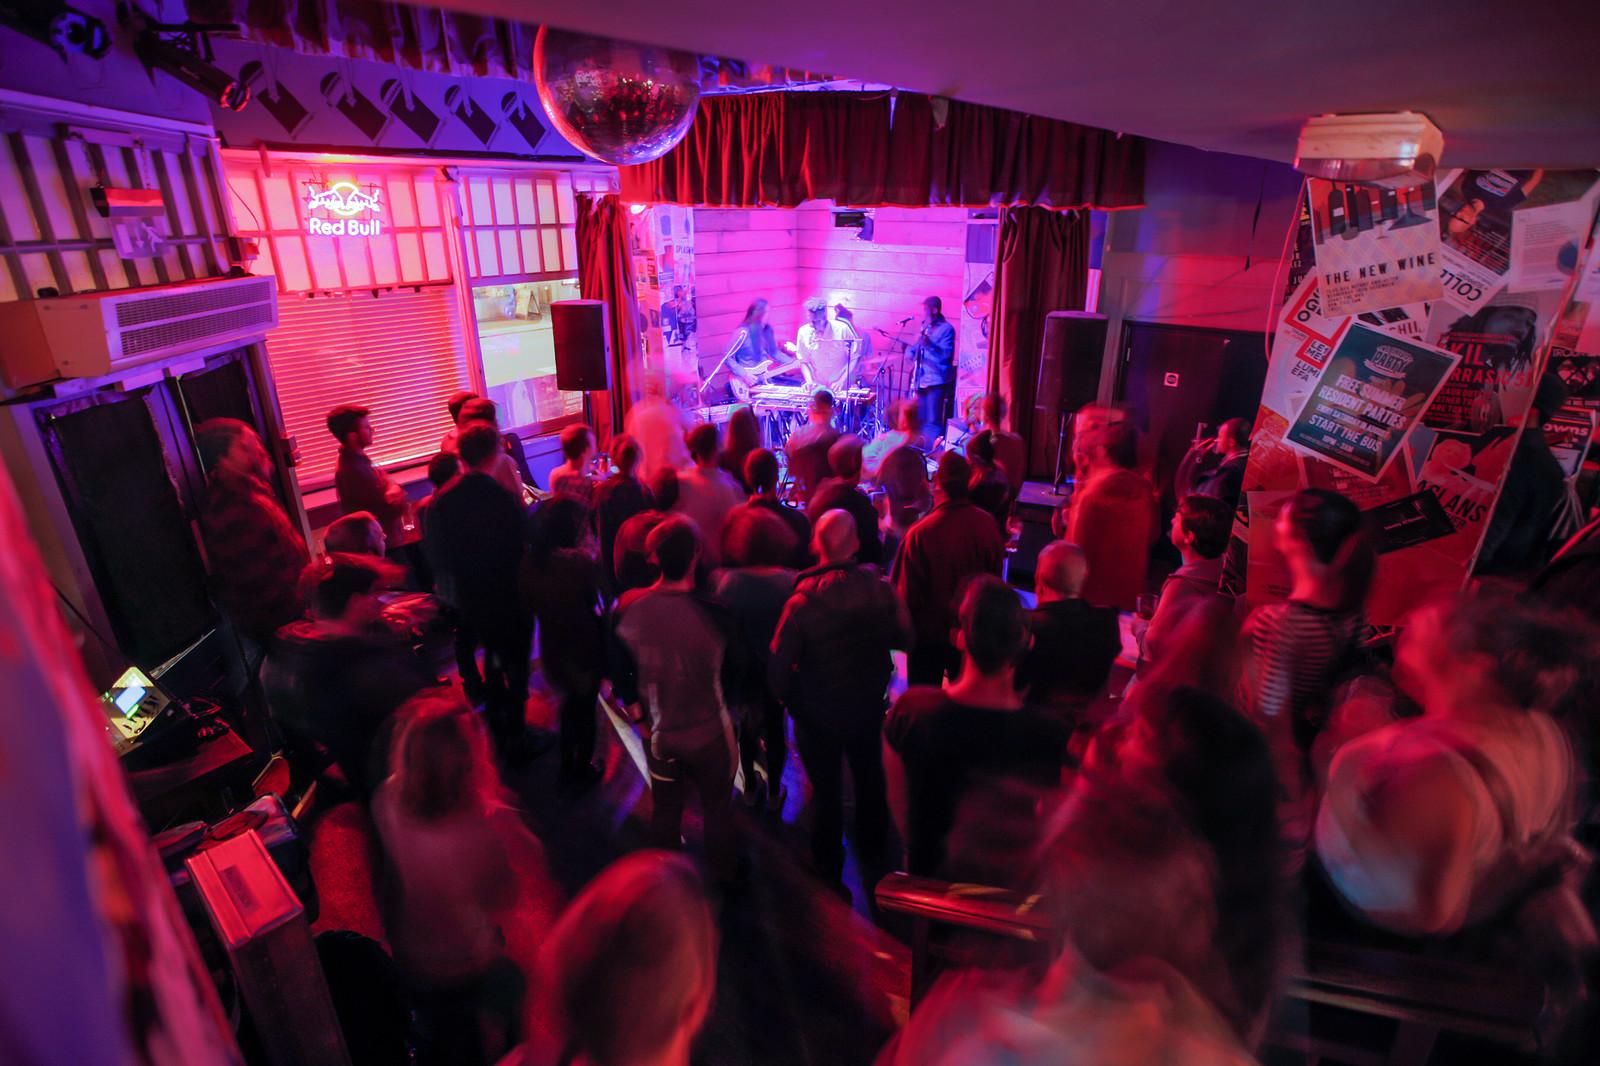 Bristol Nightlife - Nightlife in Bristol - Nightclubs Bristol